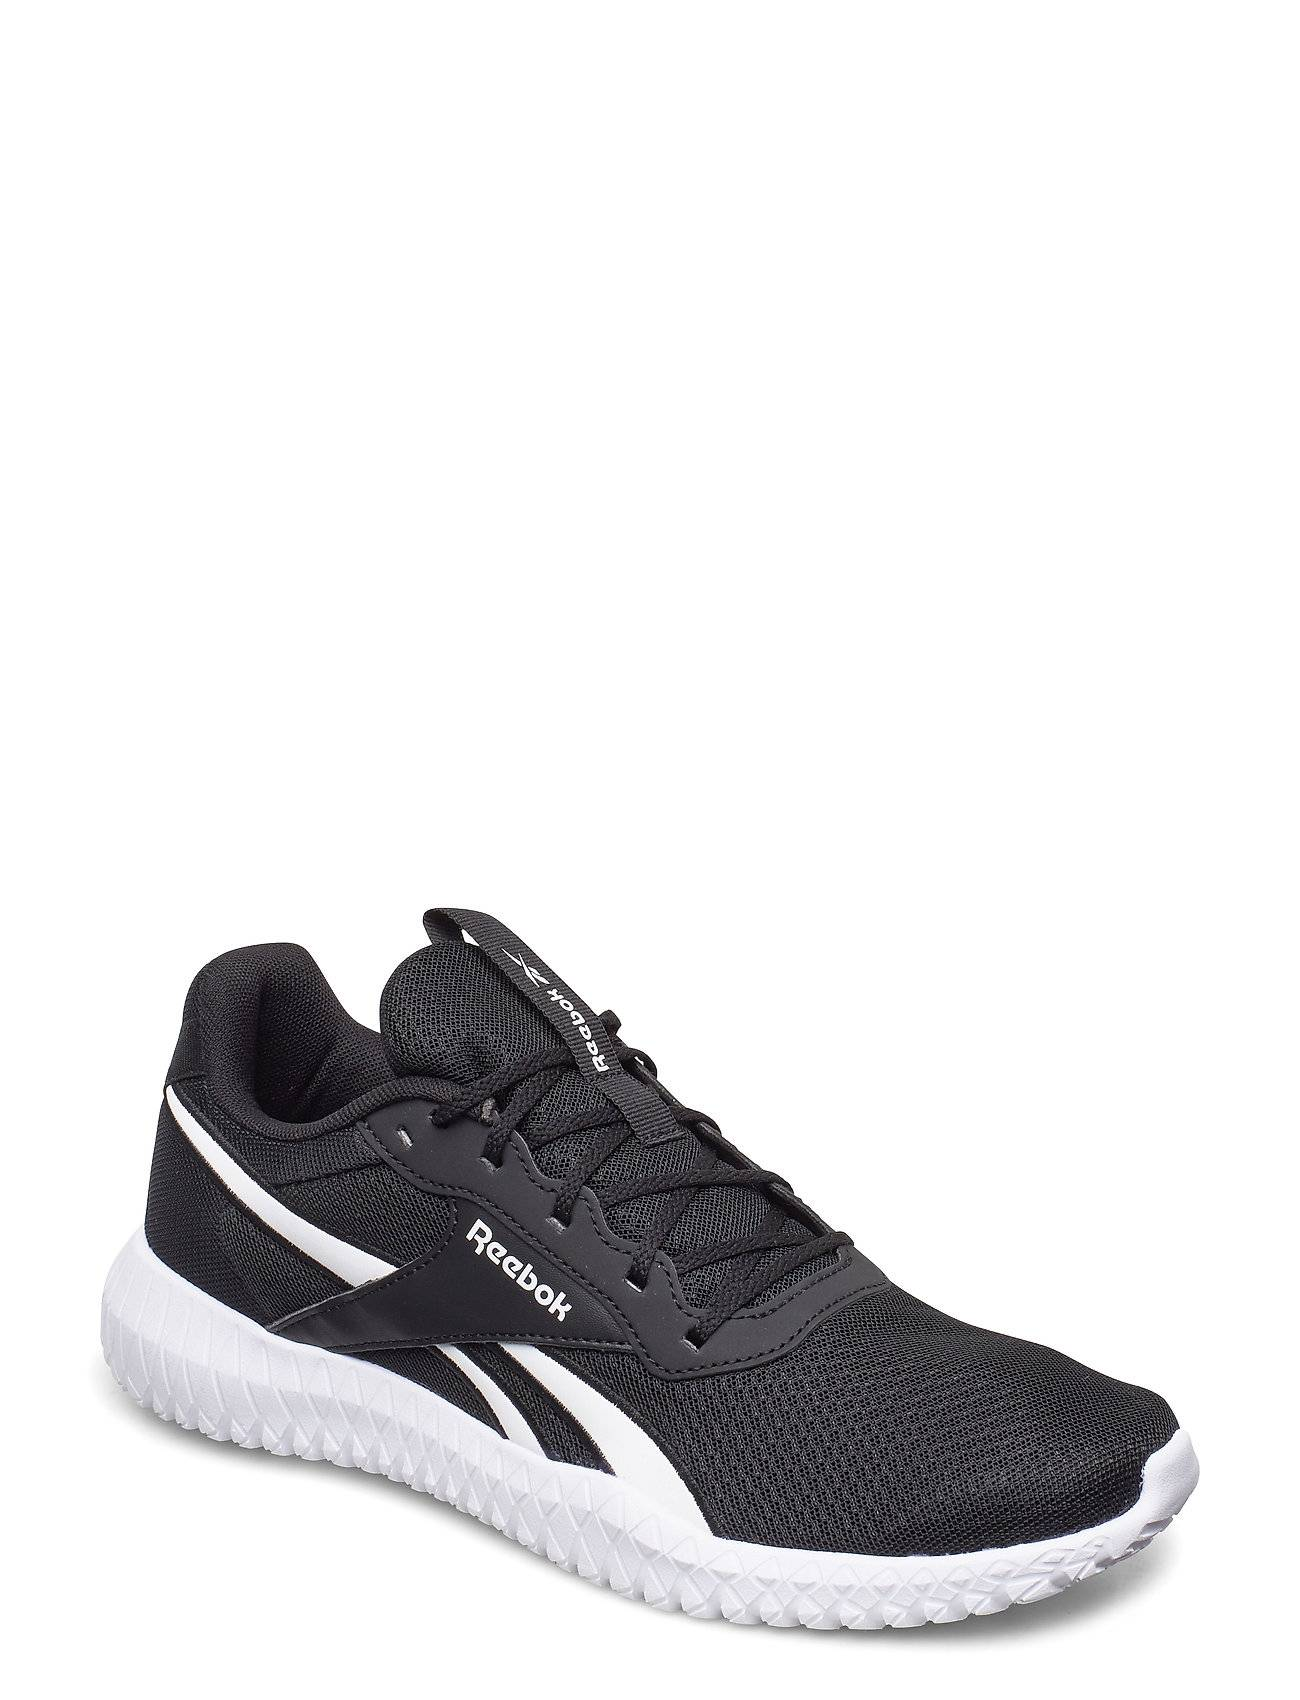 Reebok Performance Reebok Flexagon Energy Tr 2 Eu Shoes Sport Shoes Training Shoes- Golf/tennis/fitness Musta Reebok Performance